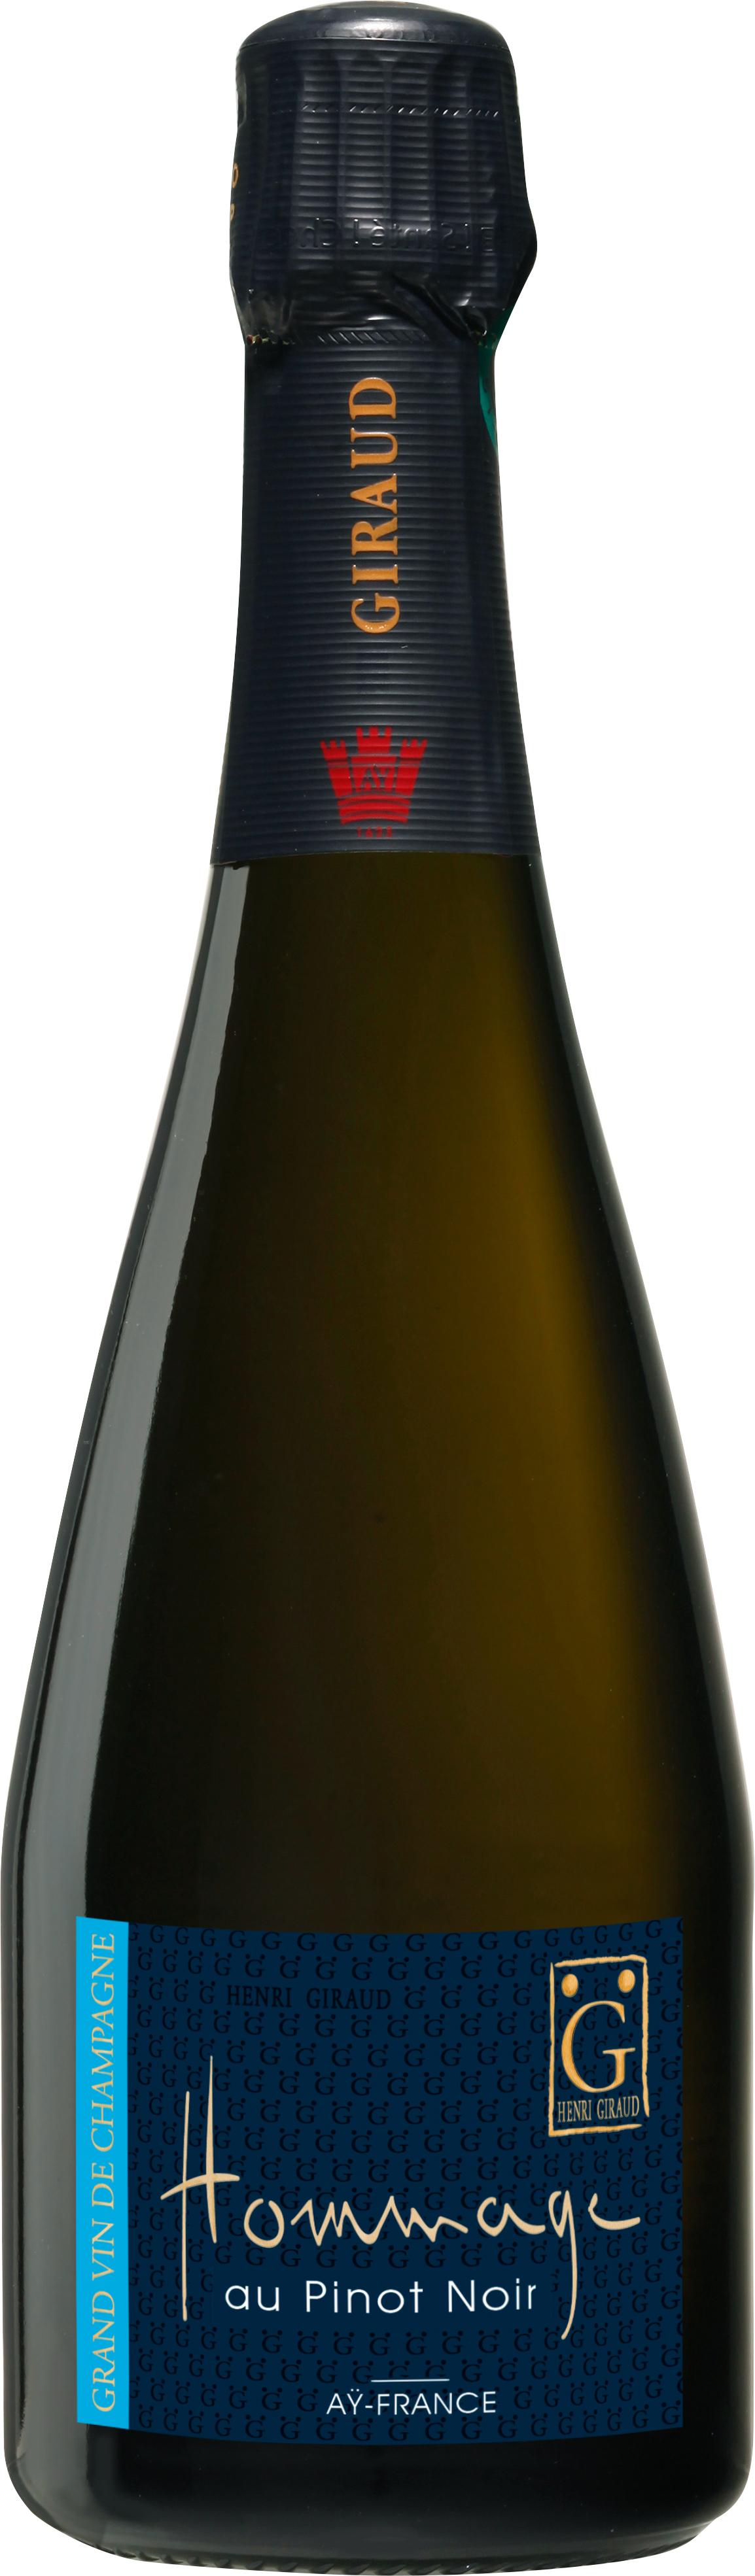 Domaine Henri Giraud Hommage au Pinot Noir